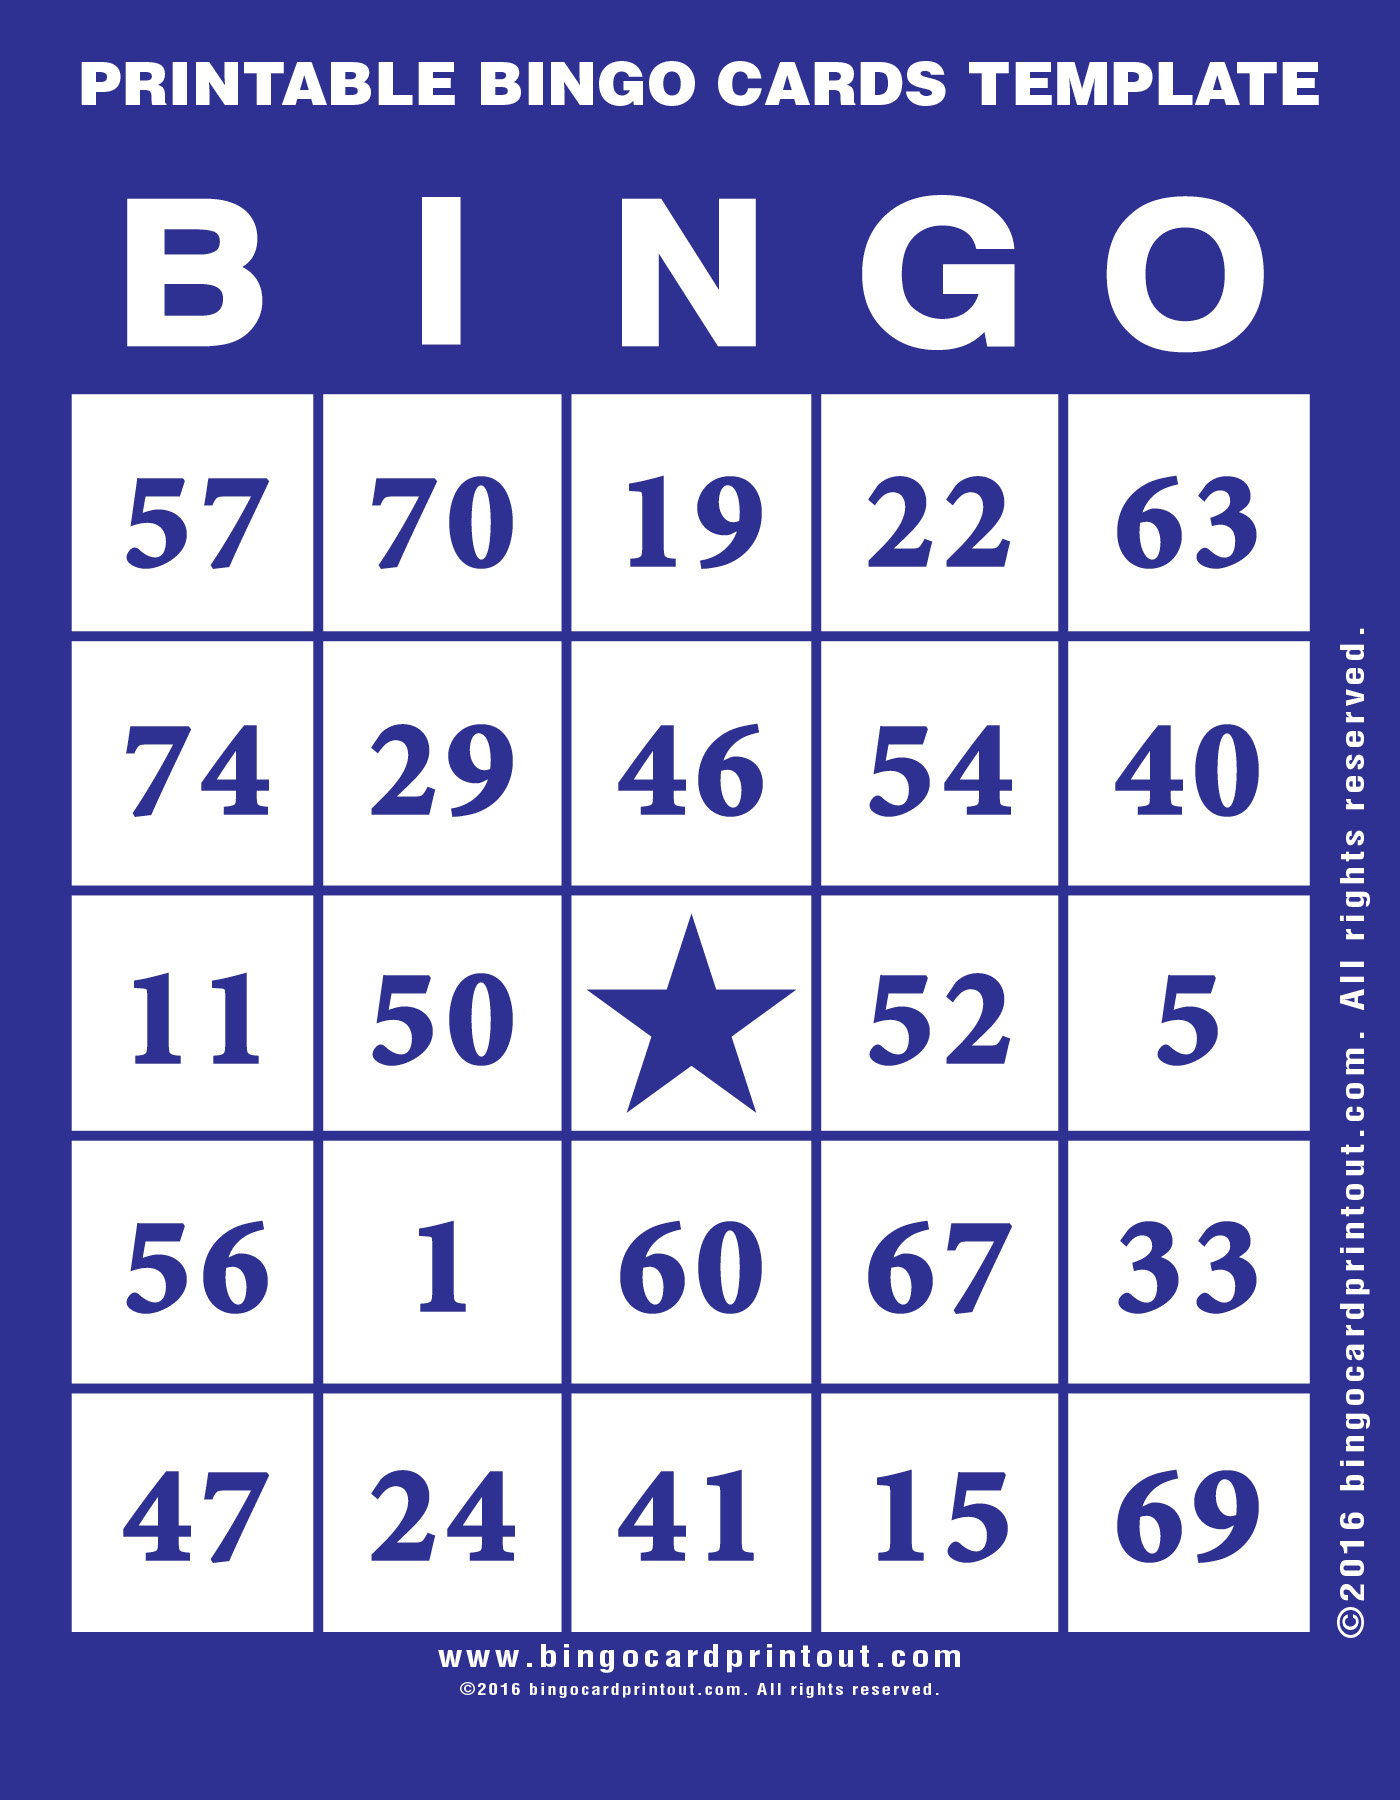 printable bingo cards template. Black Bedroom Furniture Sets. Home Design Ideas